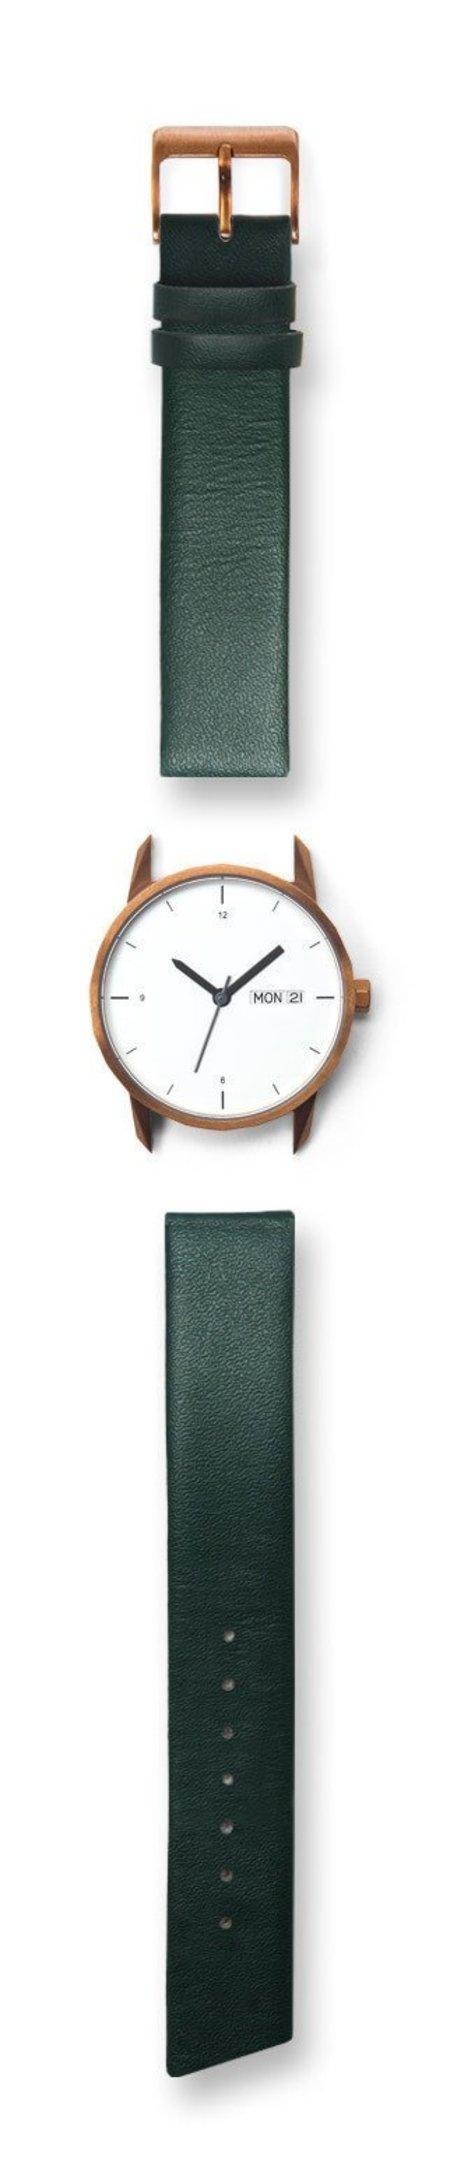 Unisex Tinker Watches 34mm Standard Strap Watch - Copper/Green